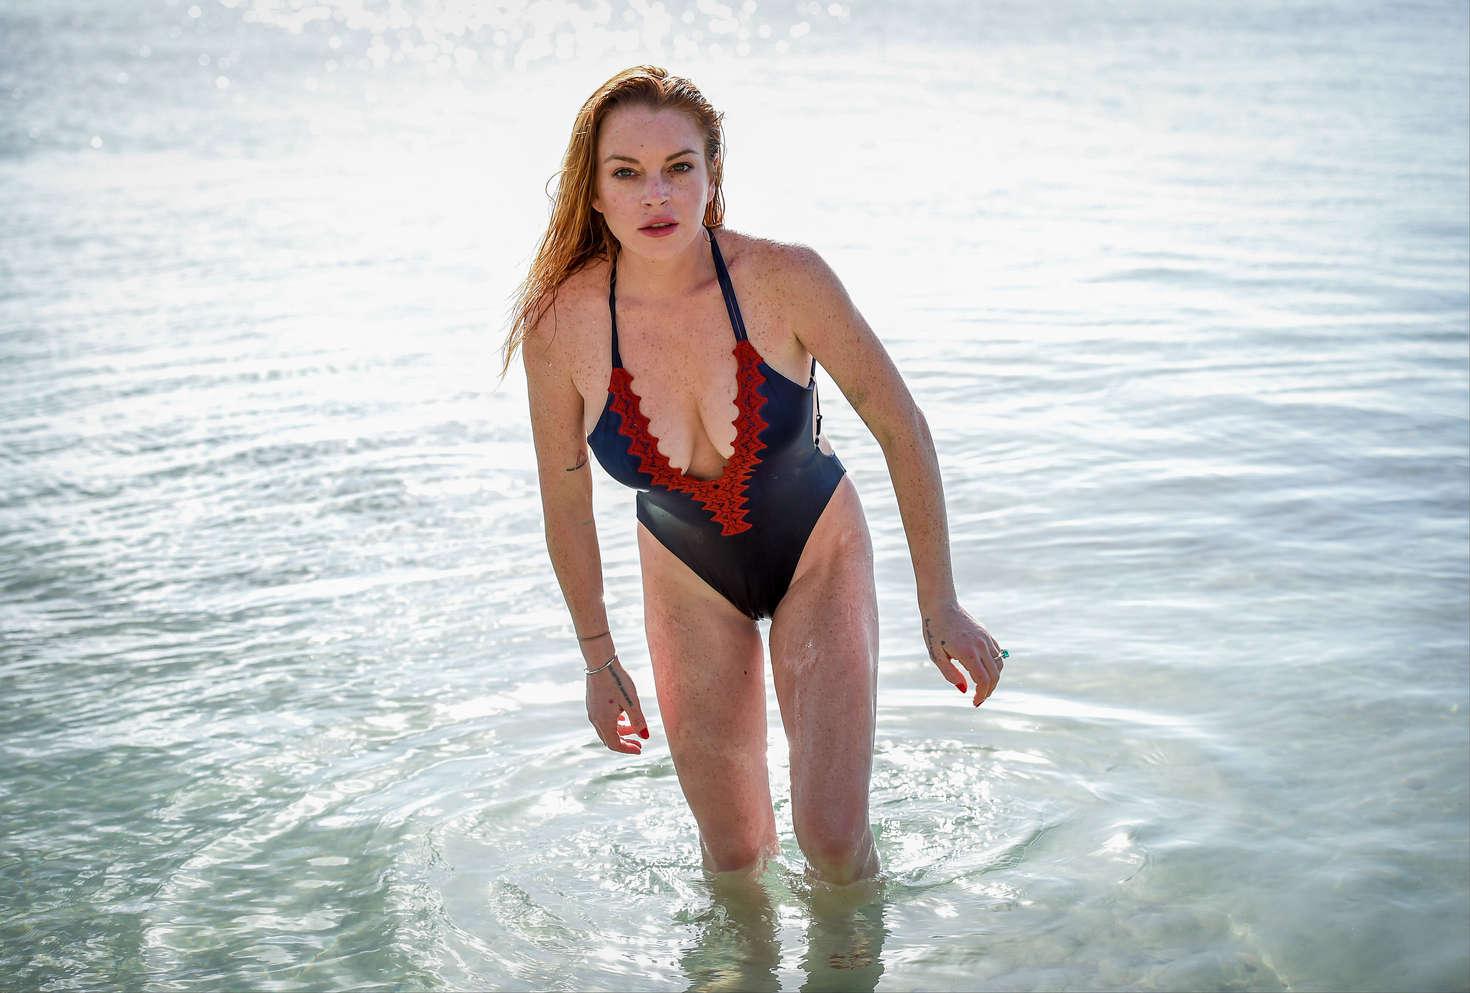 Lindsay lohan bikini pics nude